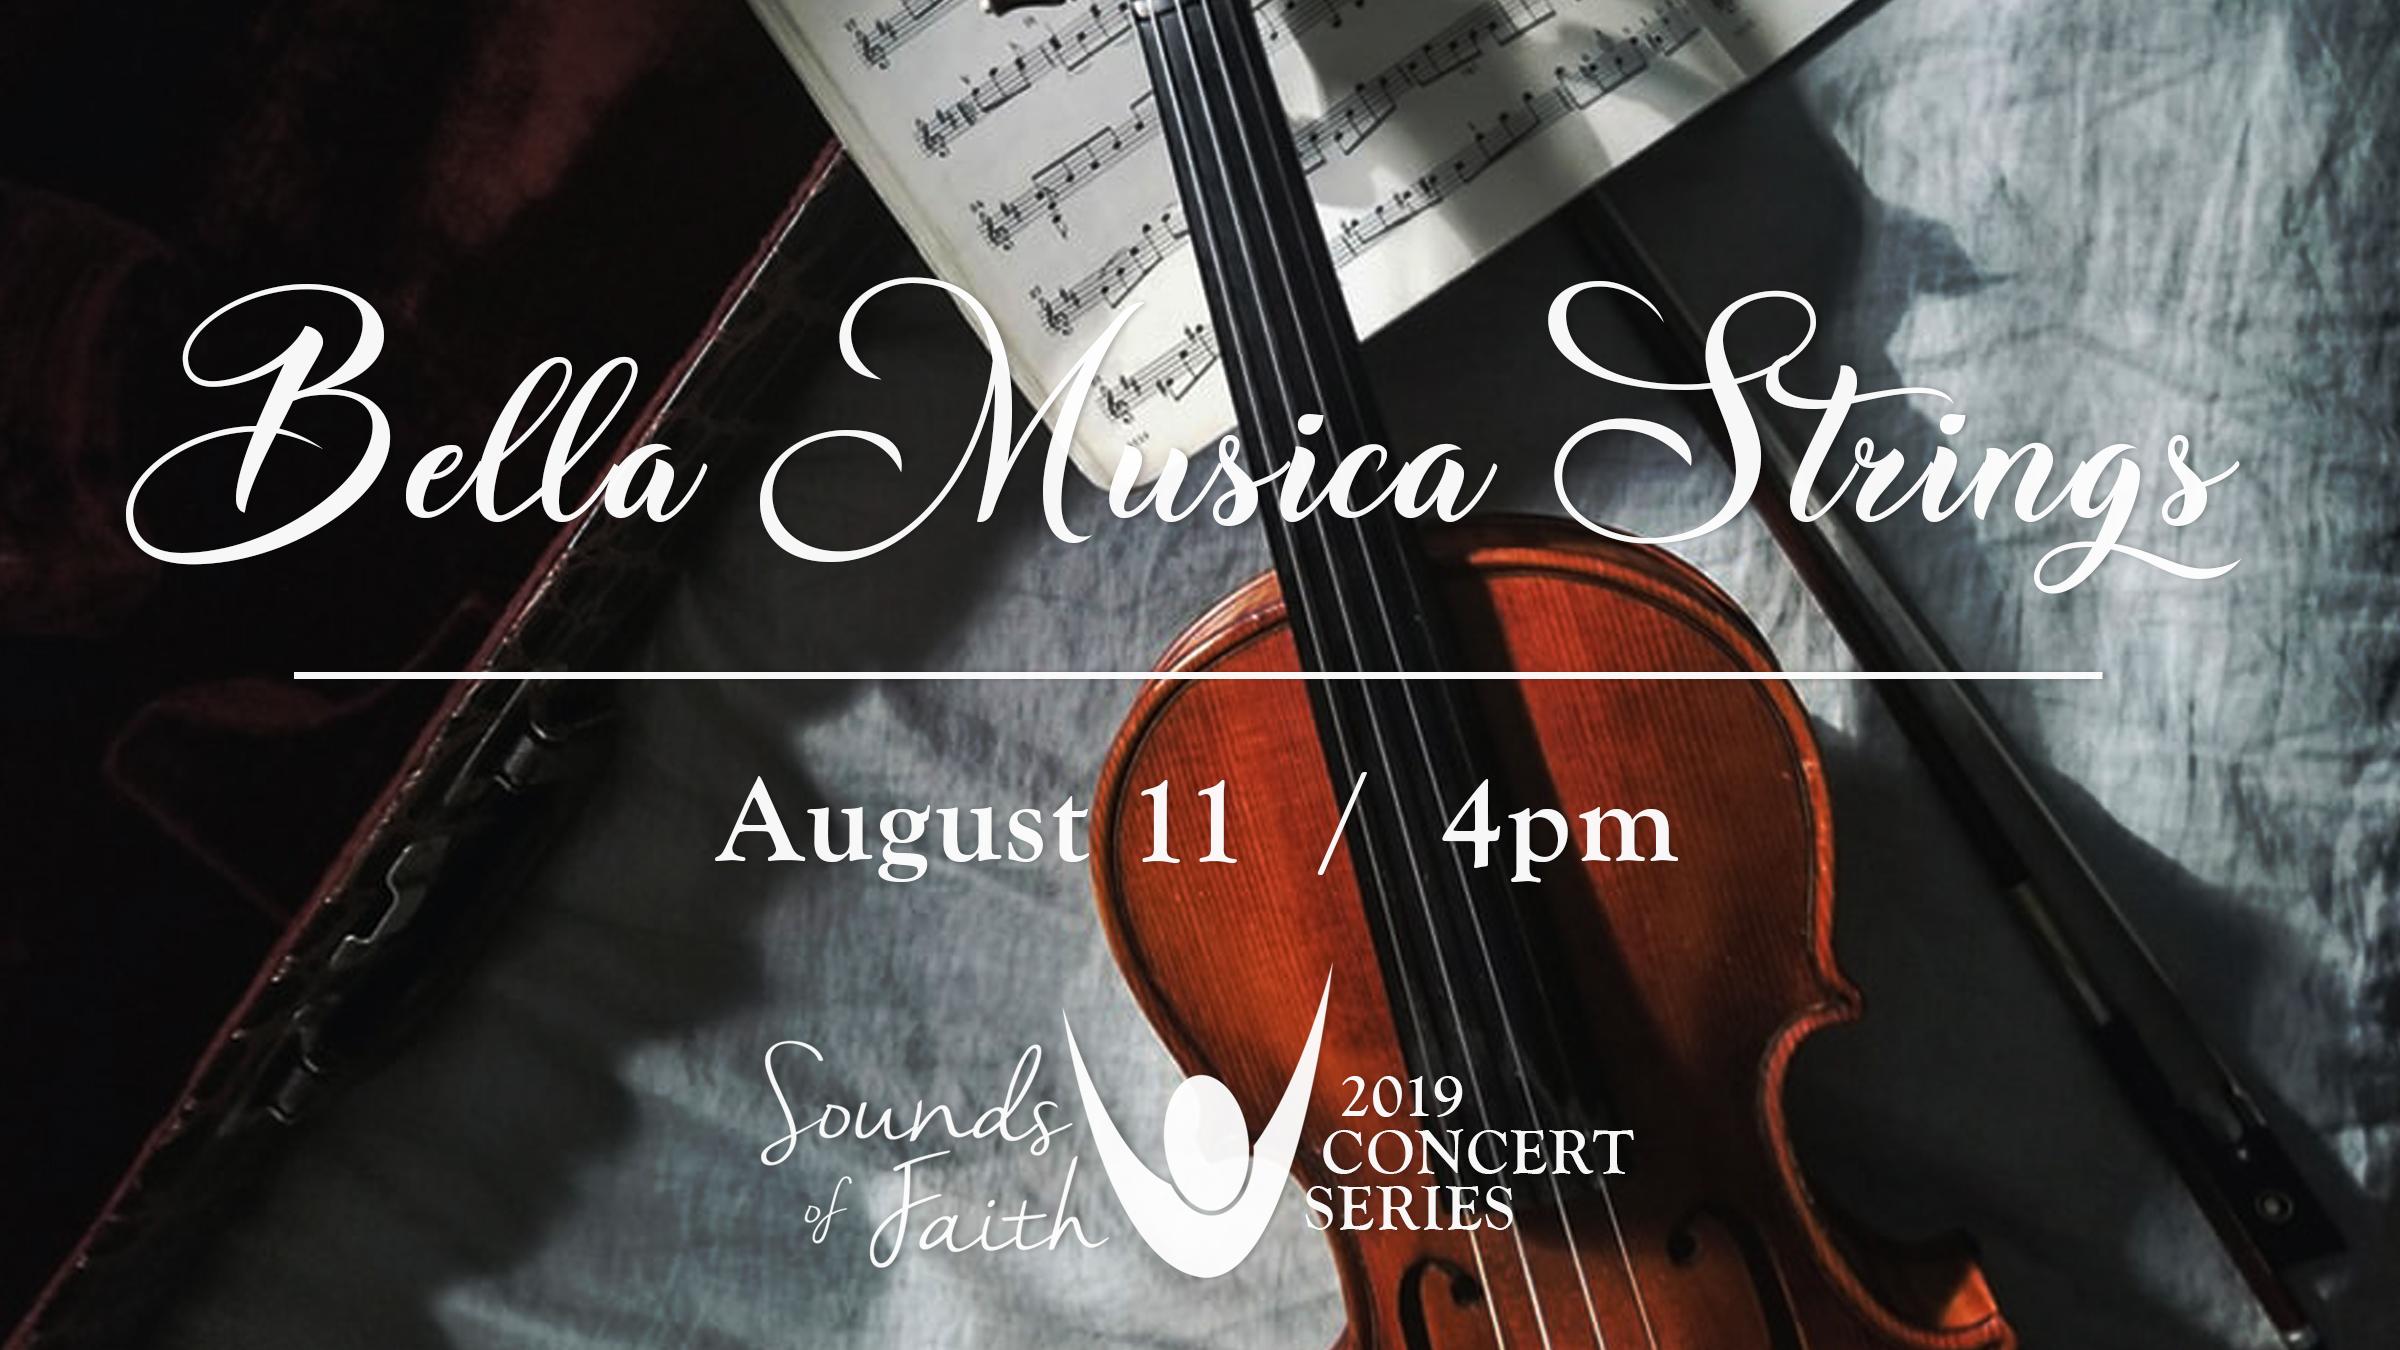 screen_soundsoffaith_concert_event_2019_bella_musica_strings2.jpg